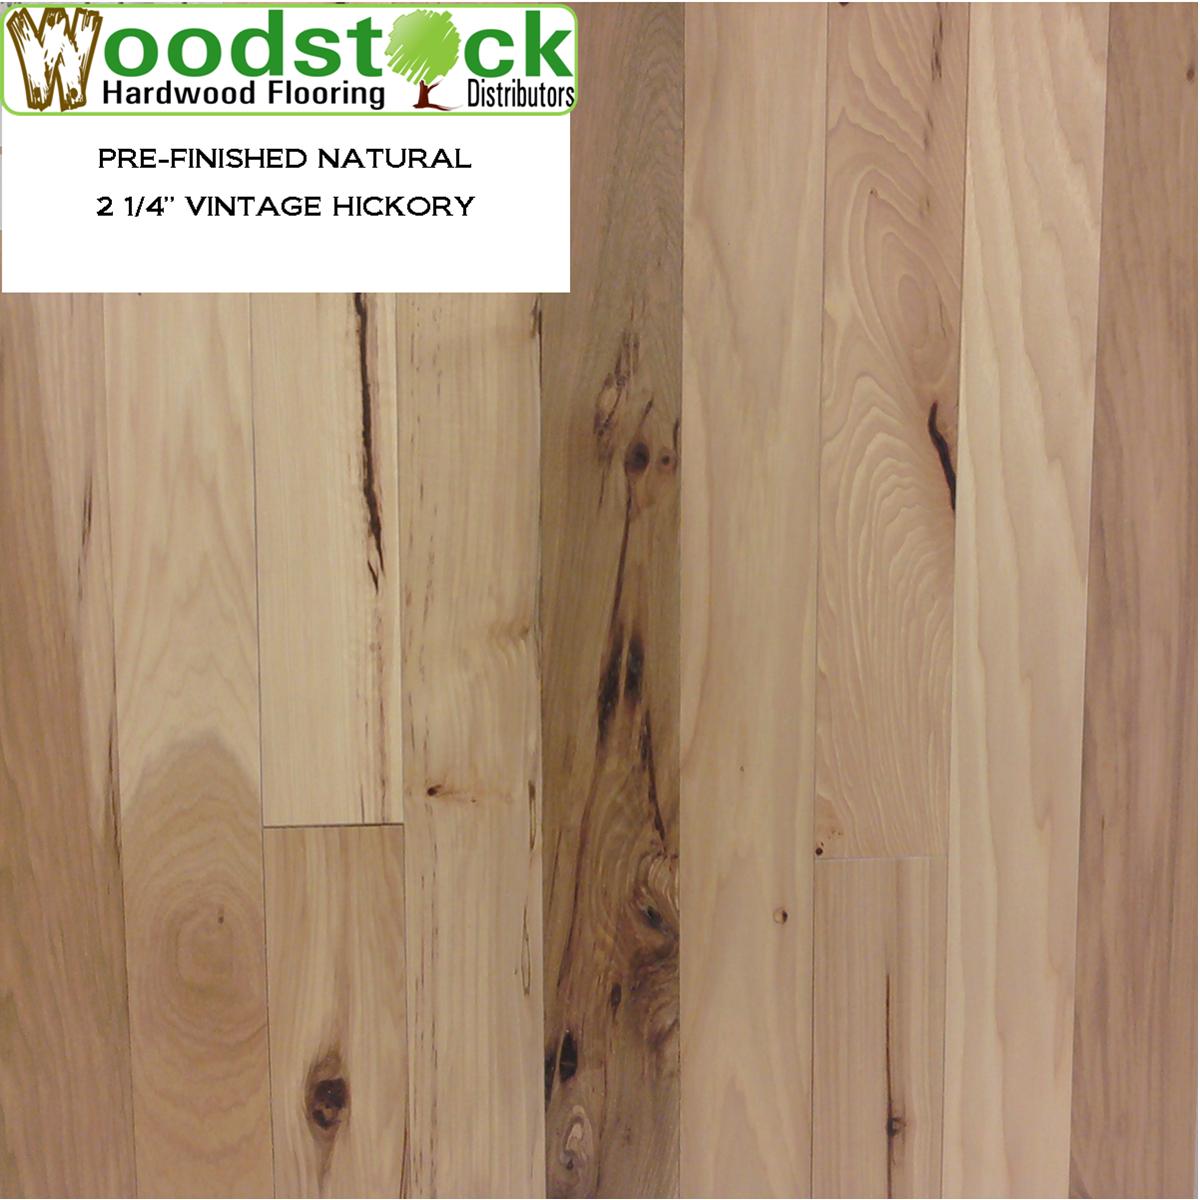 Woodstock install floors plus prefinished